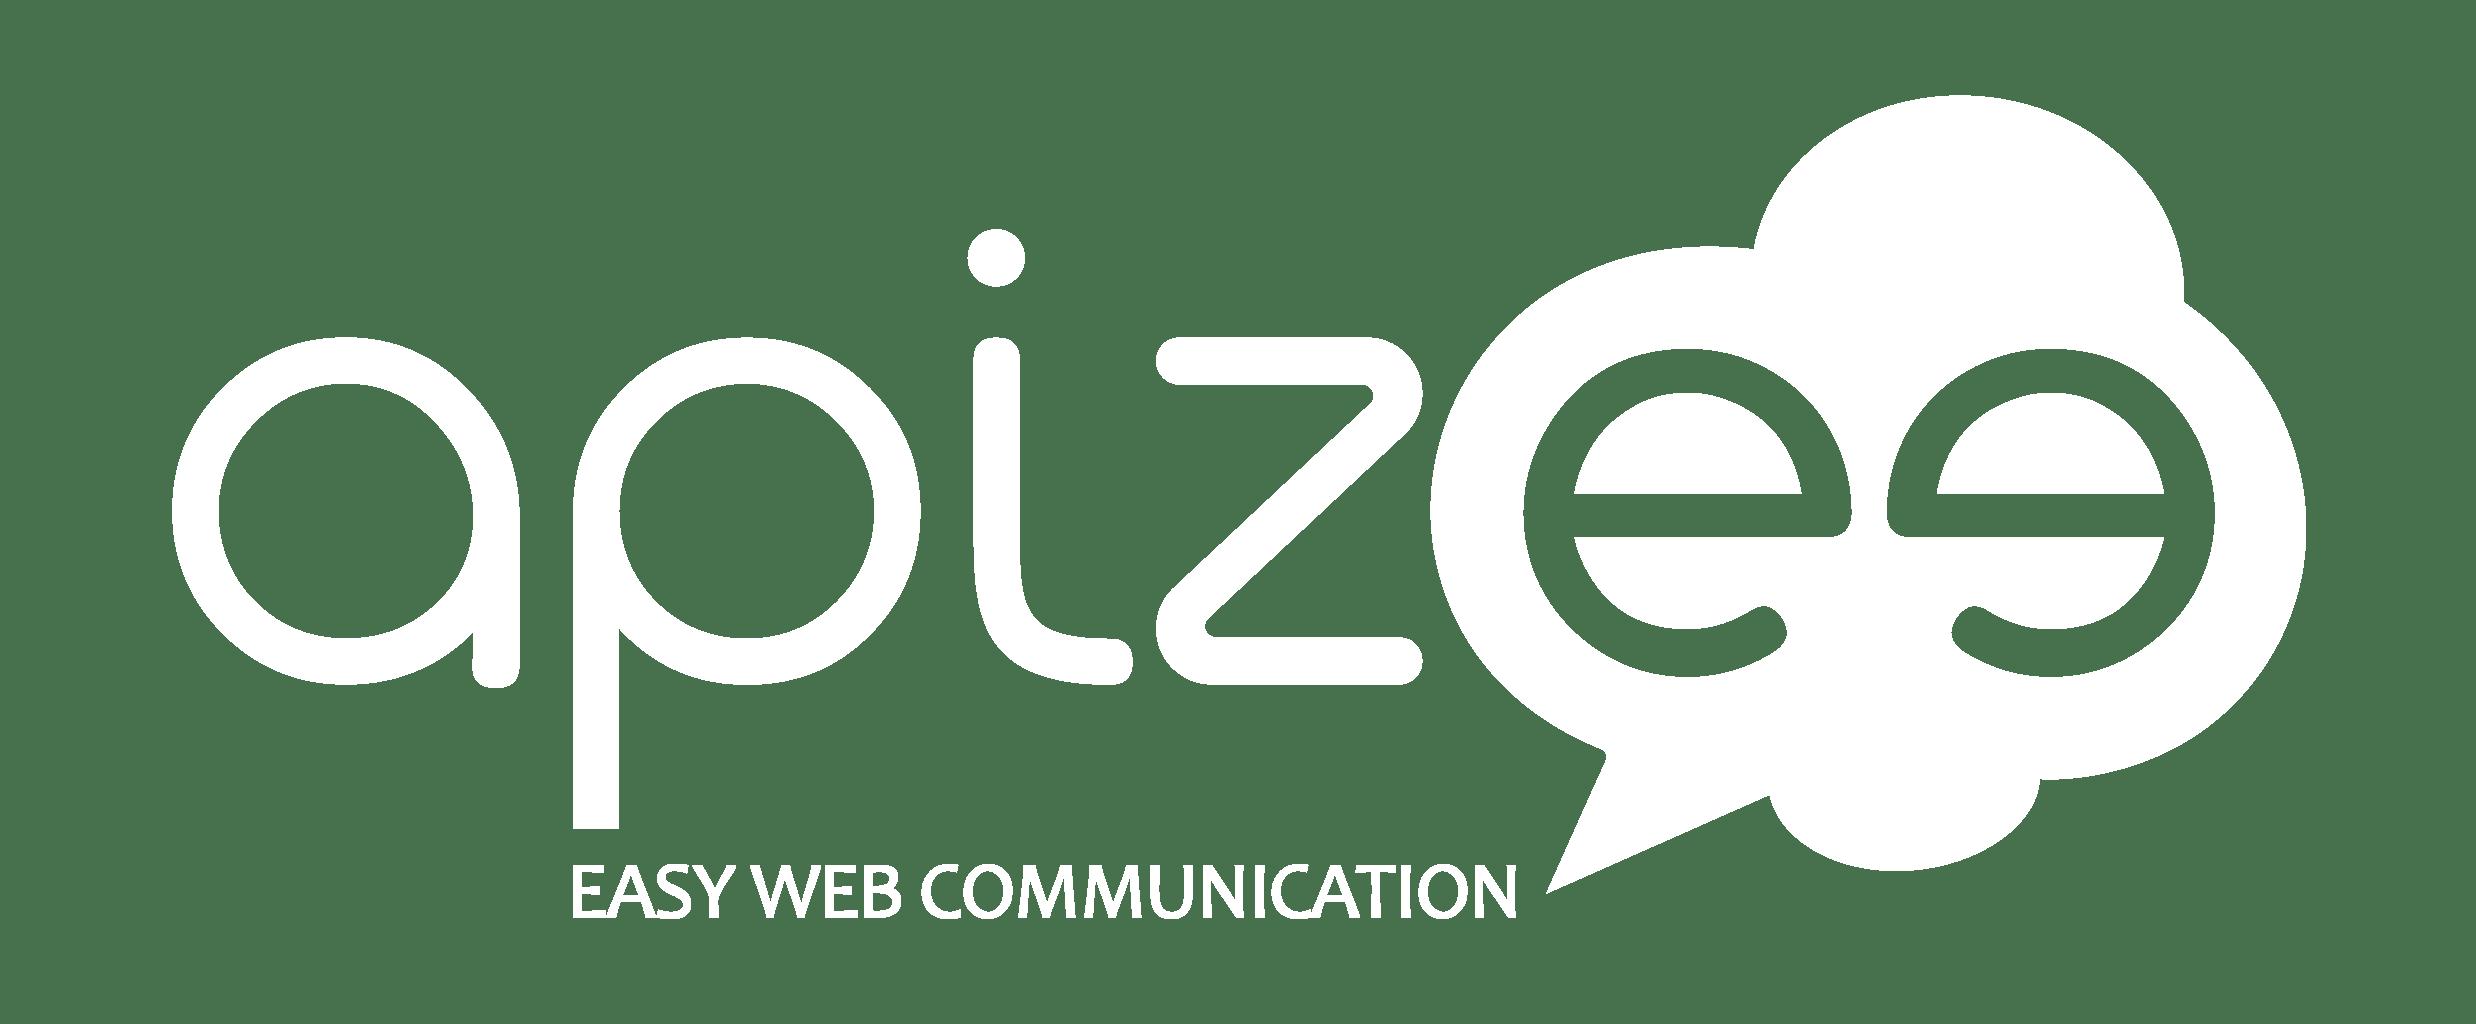 Apizee_logo_monochrome